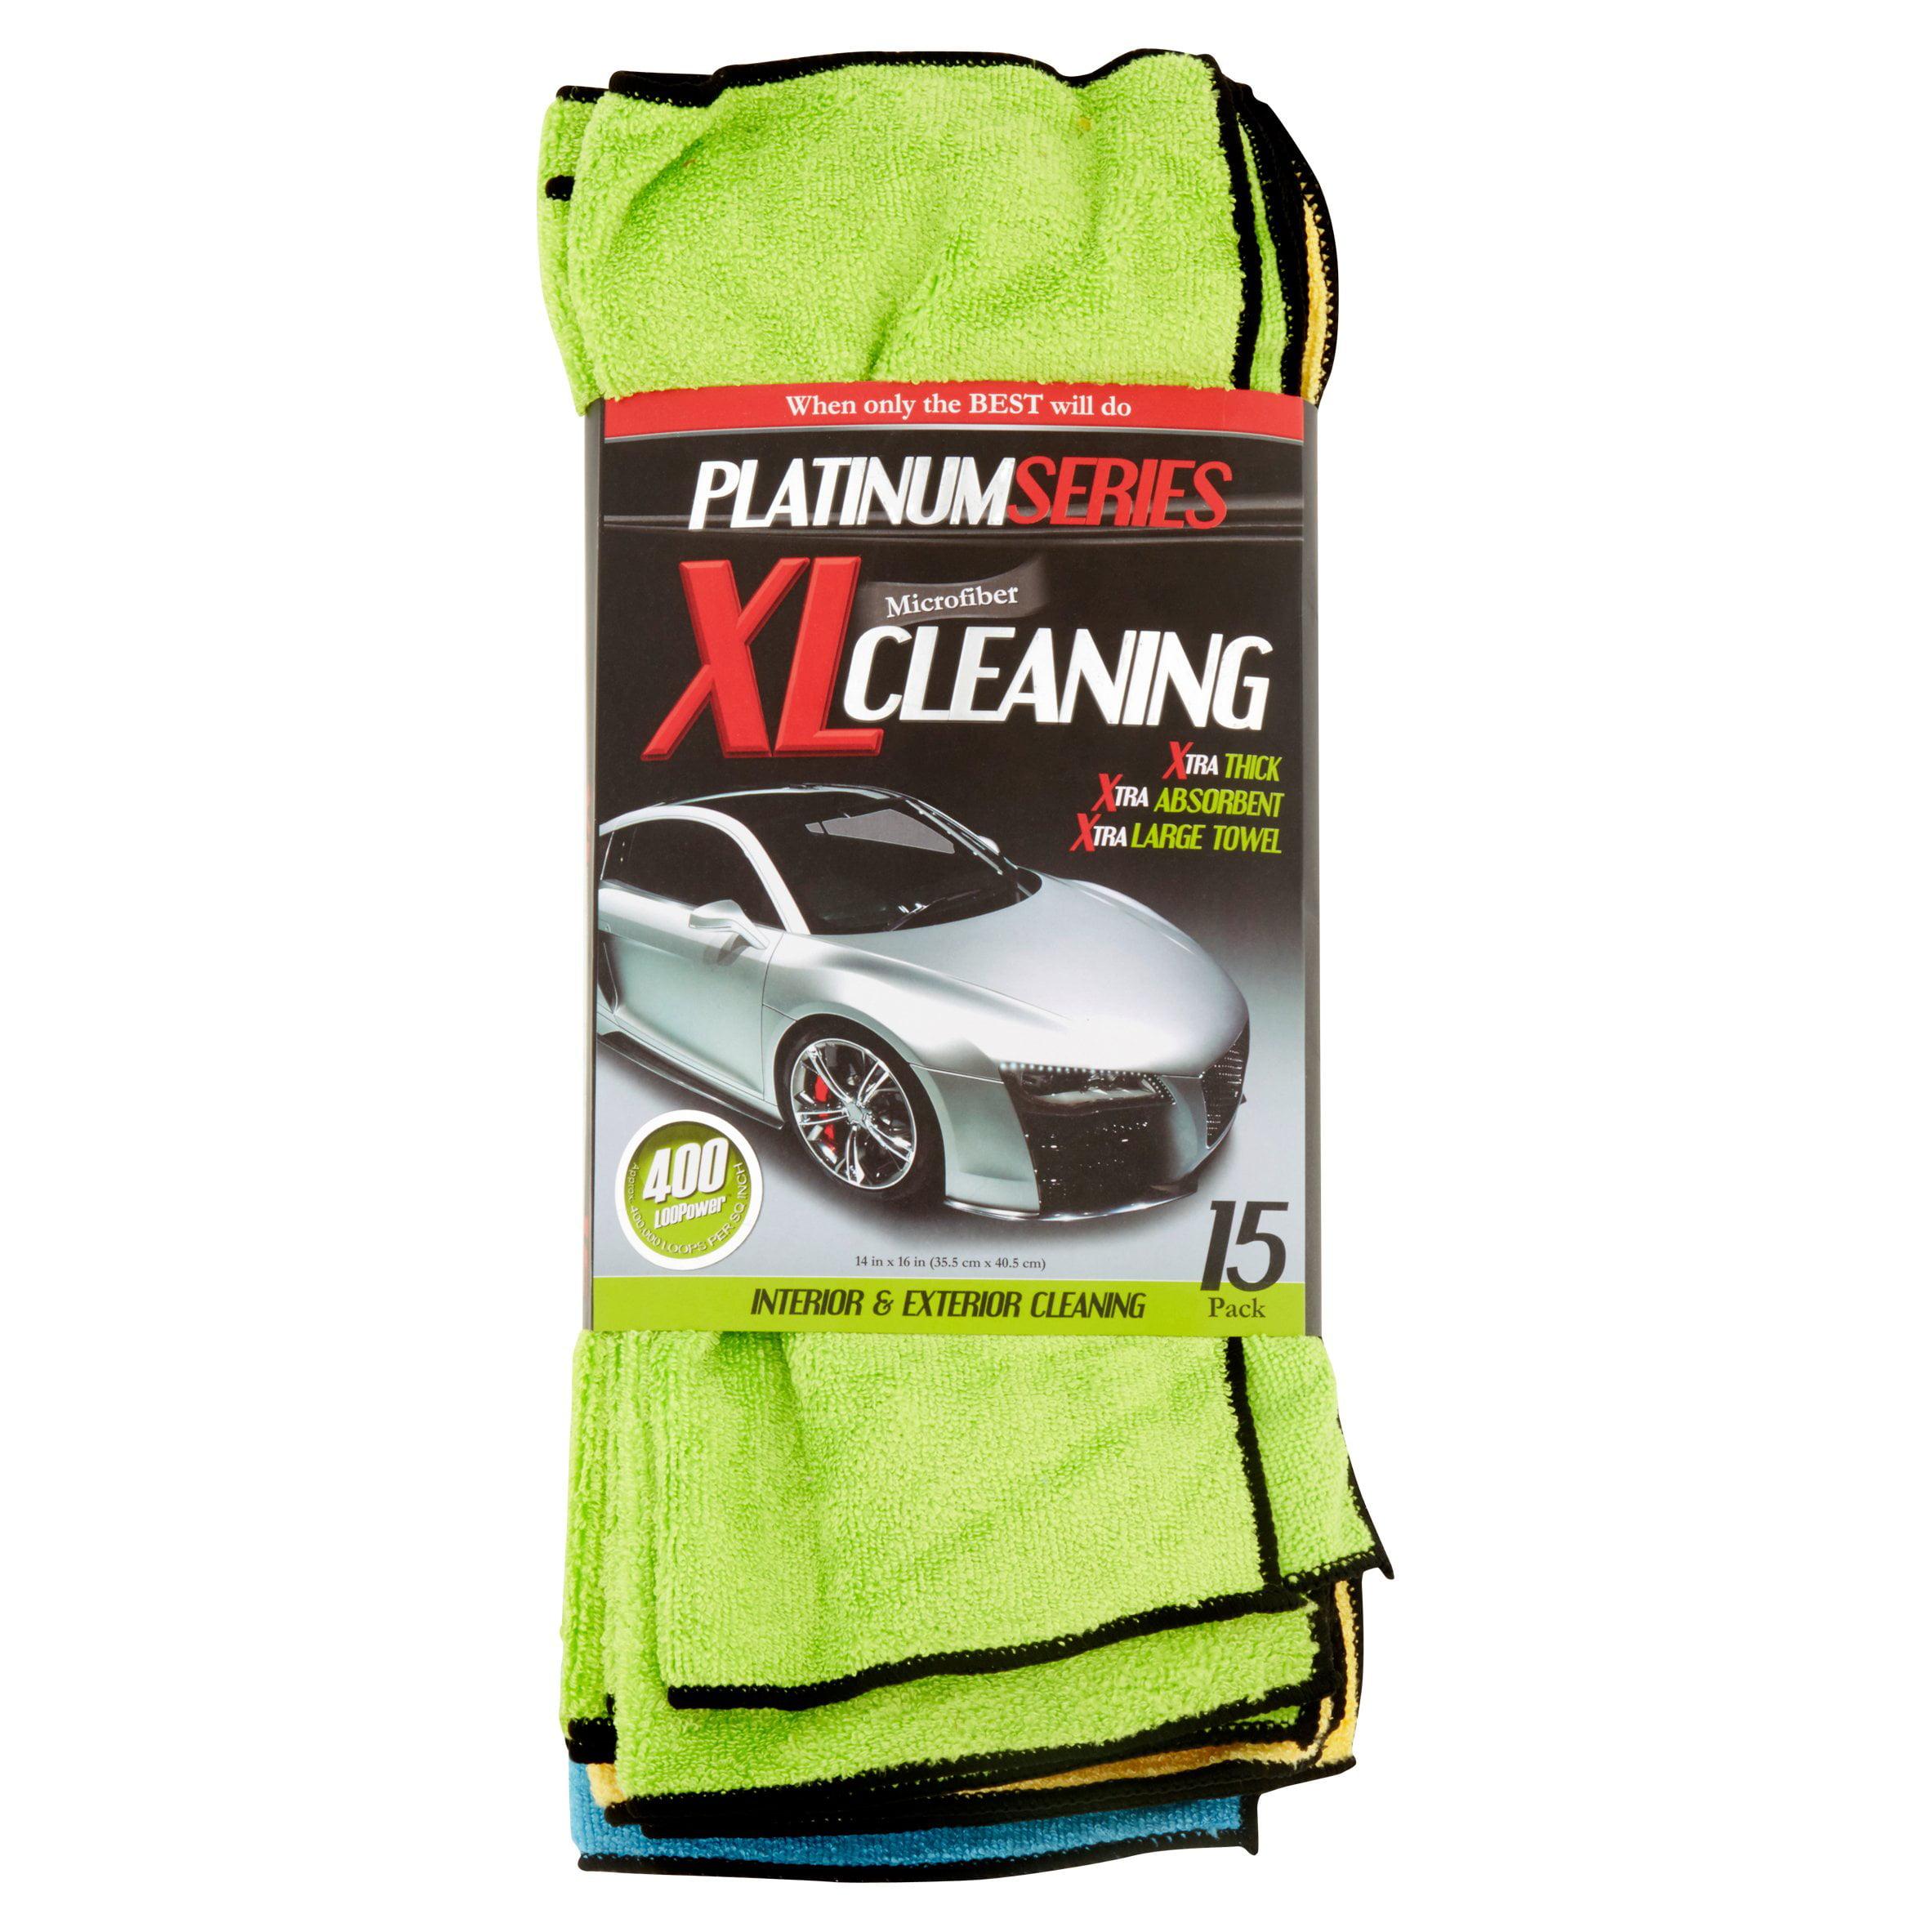 platinum series microfiber xl cleaning interior exterior platinum series microfiber xl cleaning interior exterior cleaning cloth 15 count walmart com